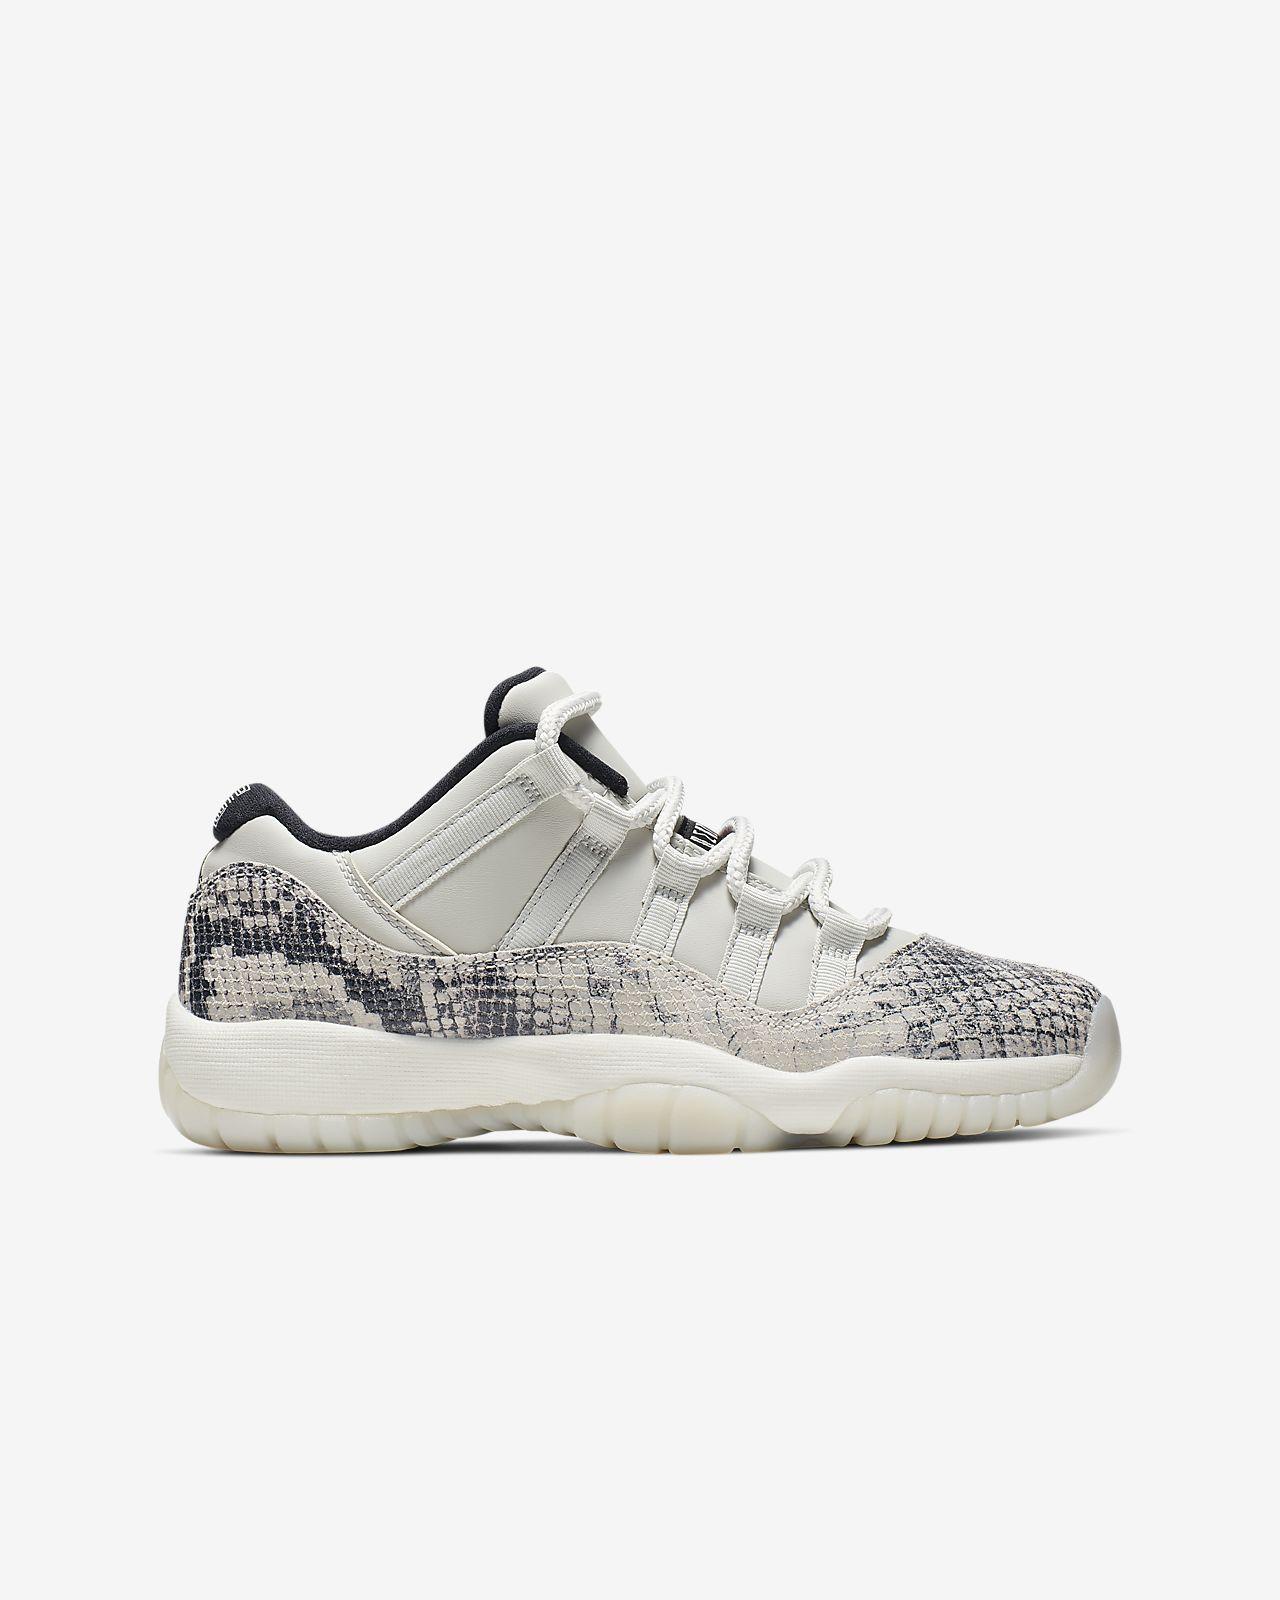 pretty nice 2defb cd9fb ... Air Jordan 11 Retro Low LE Big Kids  Shoe